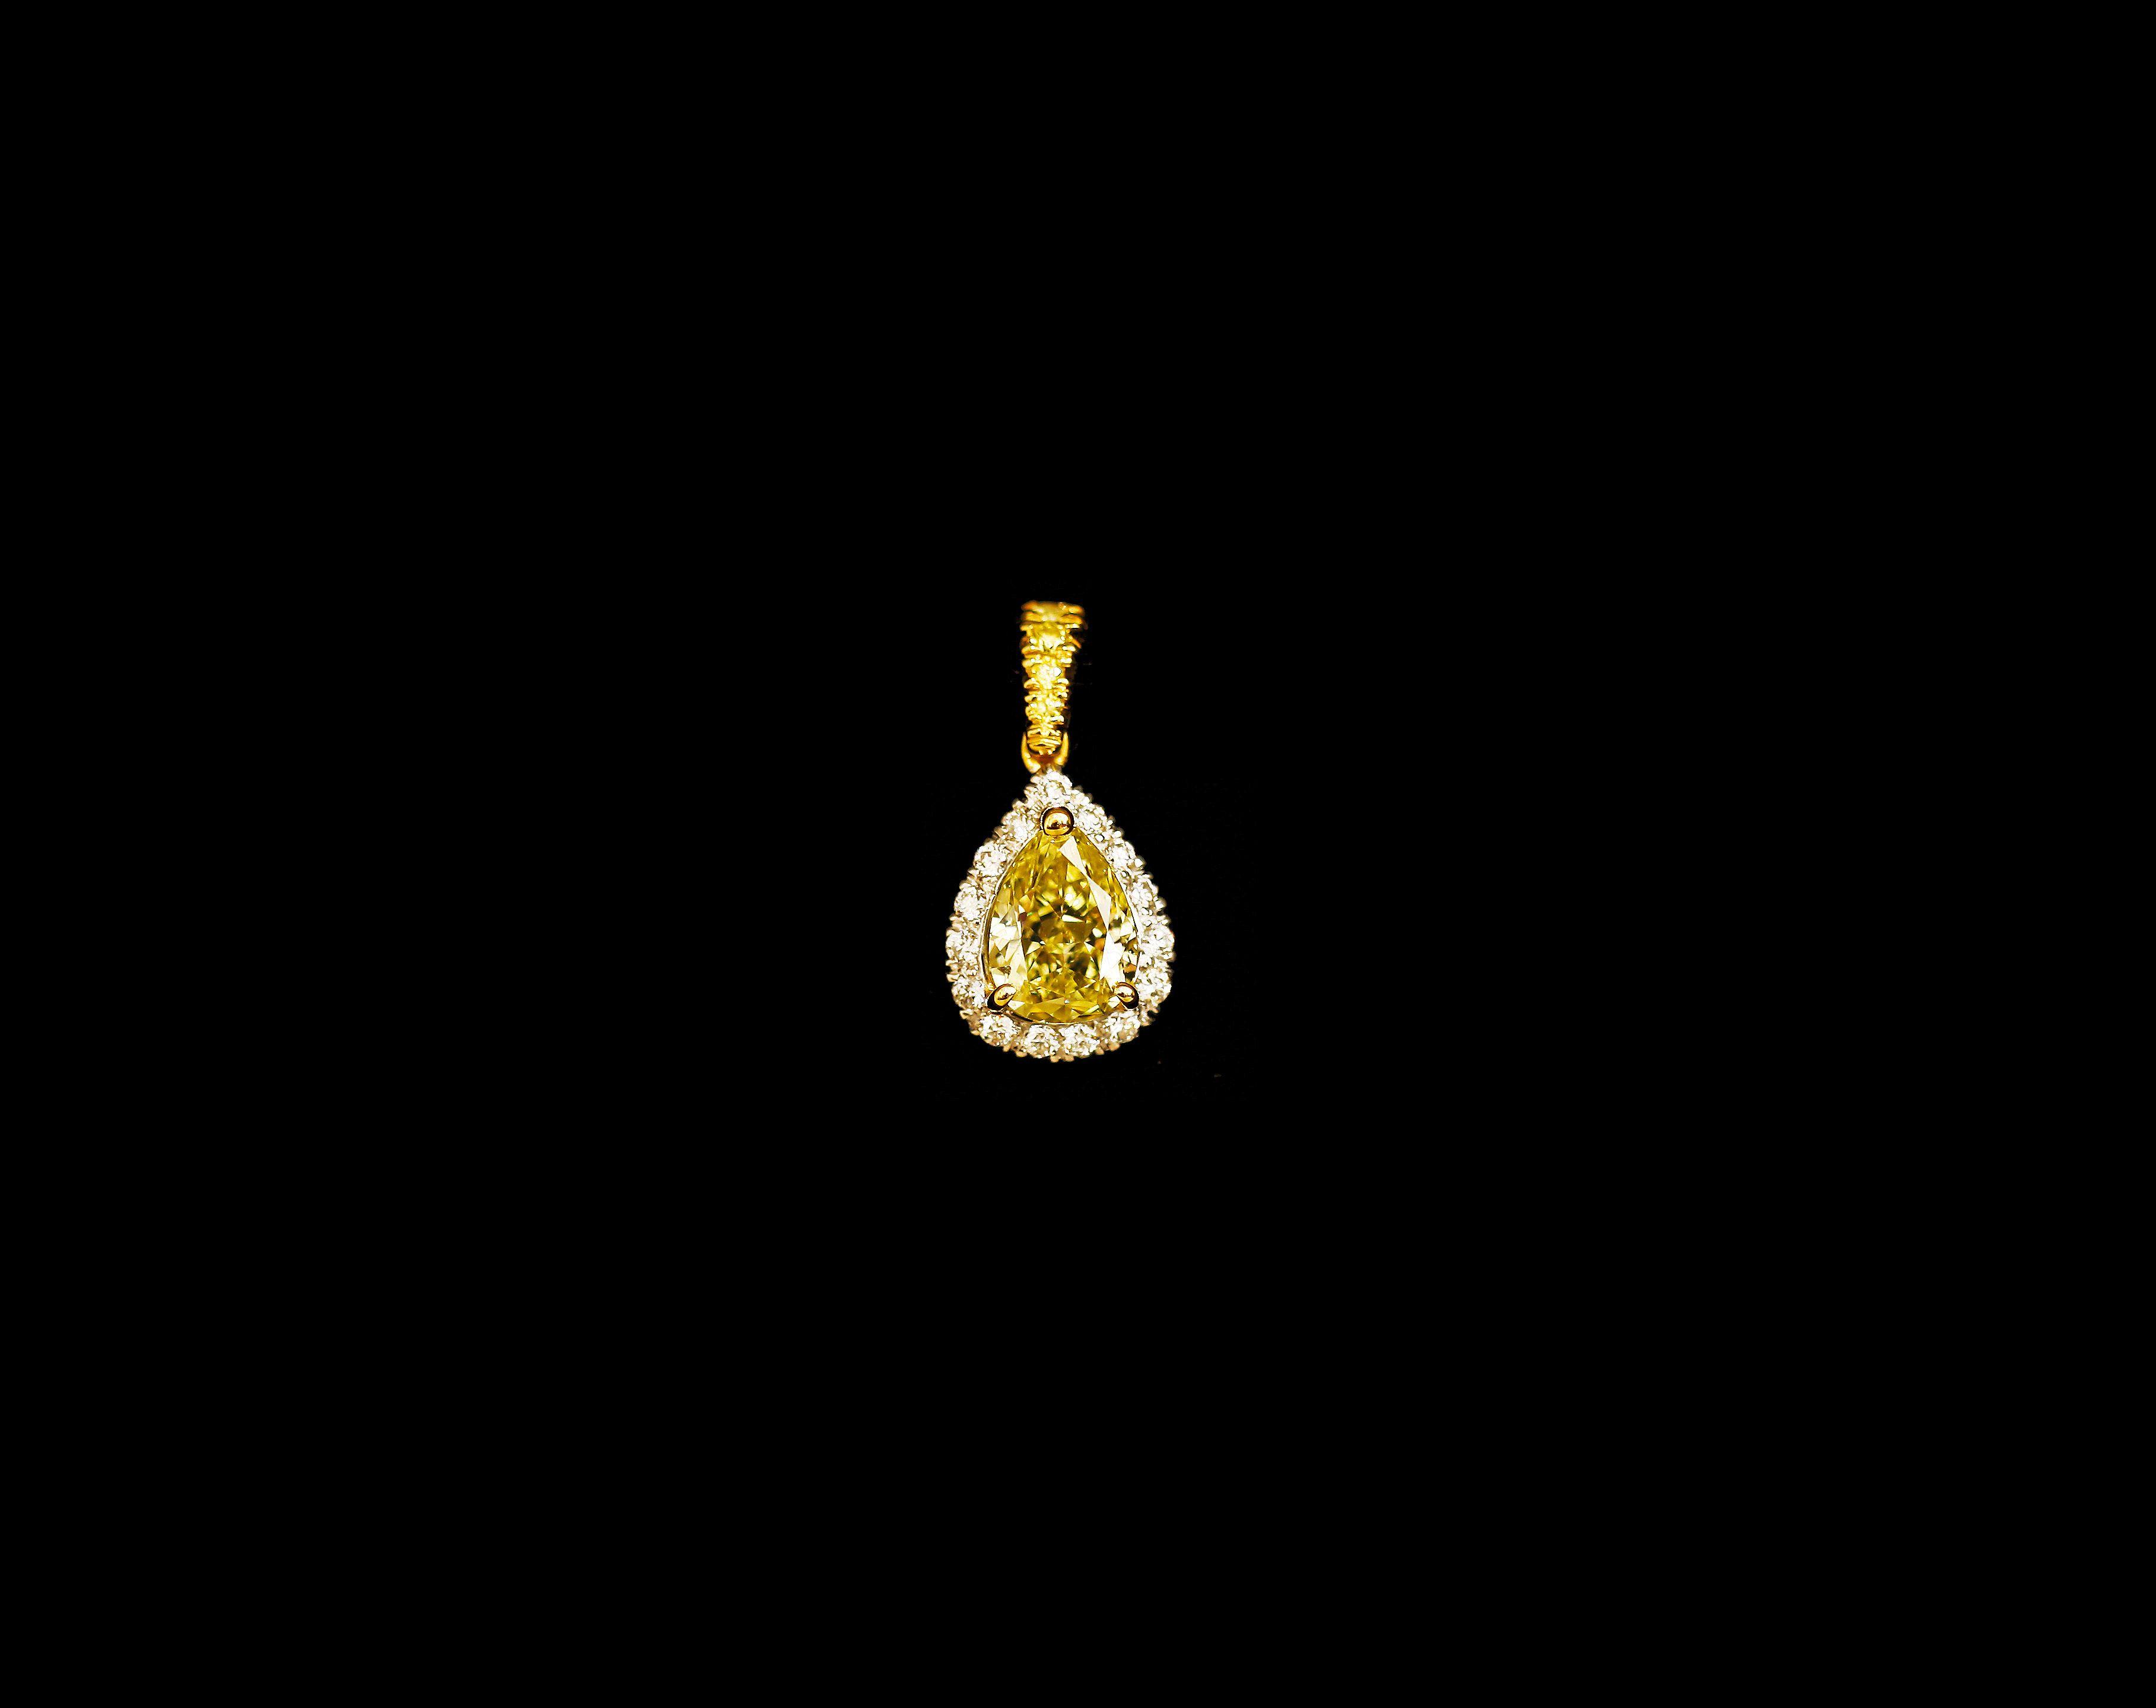 FANCY YELLOW DIAMOND PENDANT COLUCCI DIAMONDS